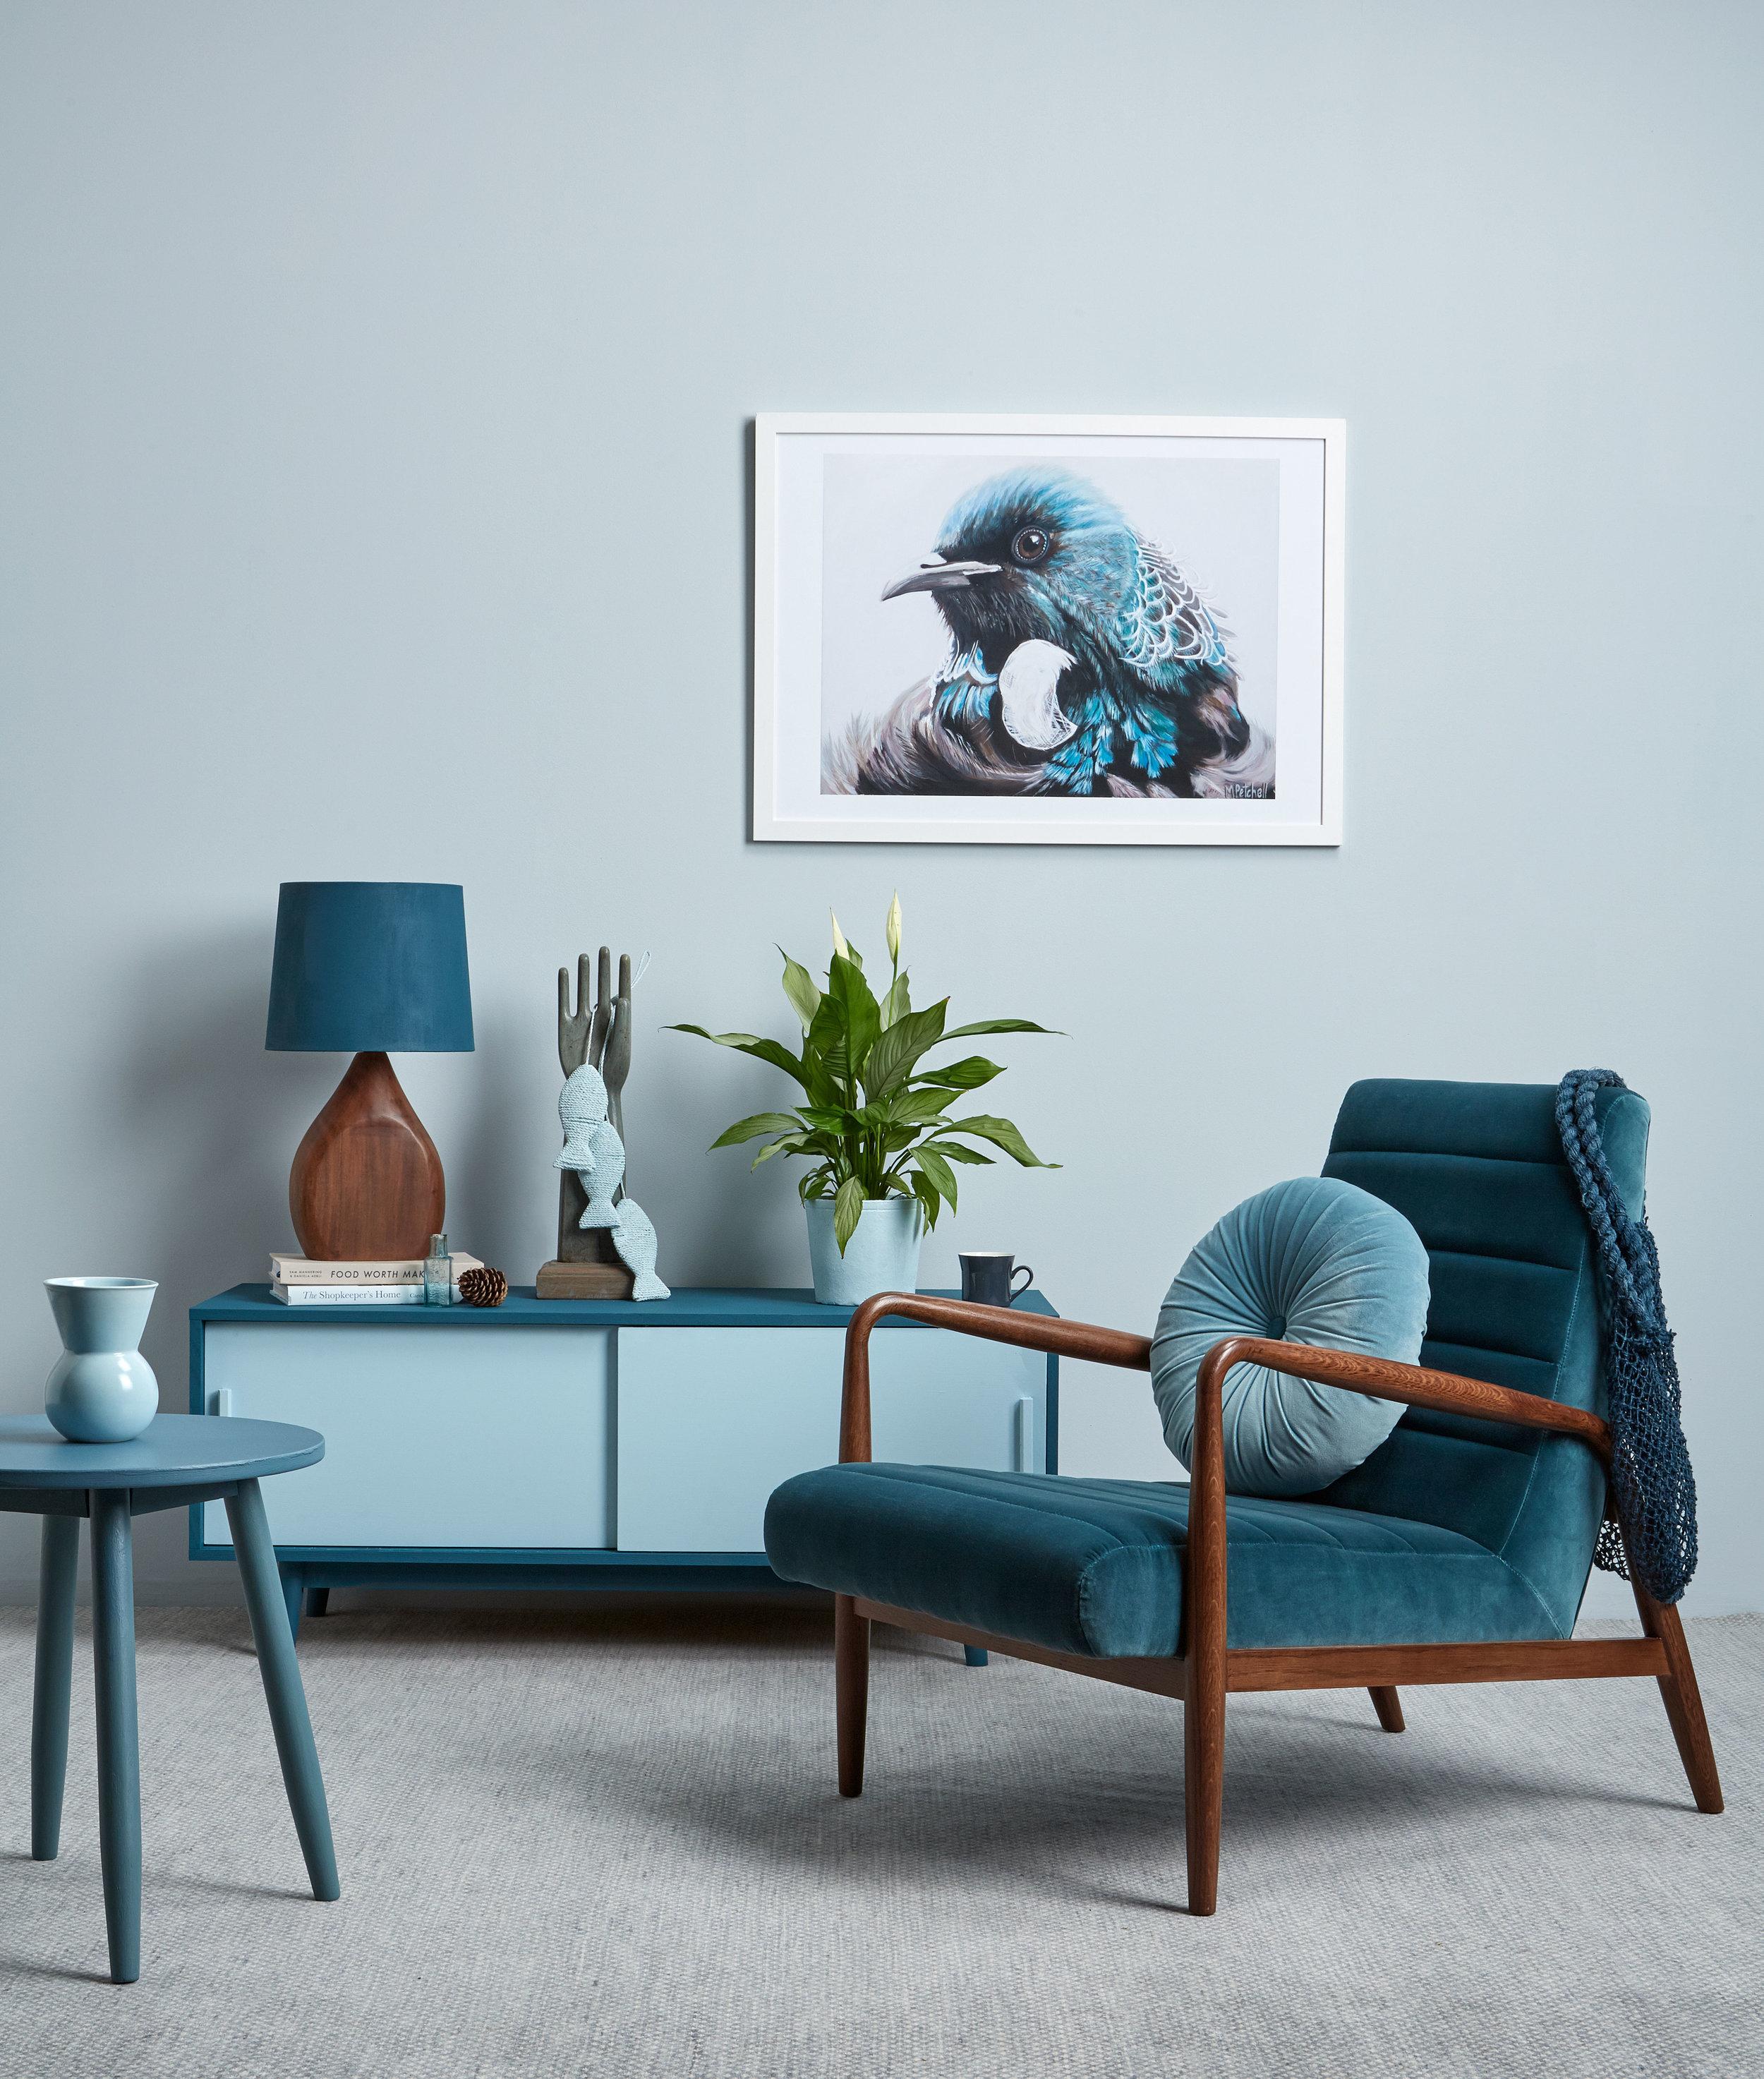 Kate-Alexander-blue-three-ways-Resene-Half-Duck-Egg-Blue+Fast-Forward+Mystery+Artemis_Photo-Bryce-CarletonHR1.jpg